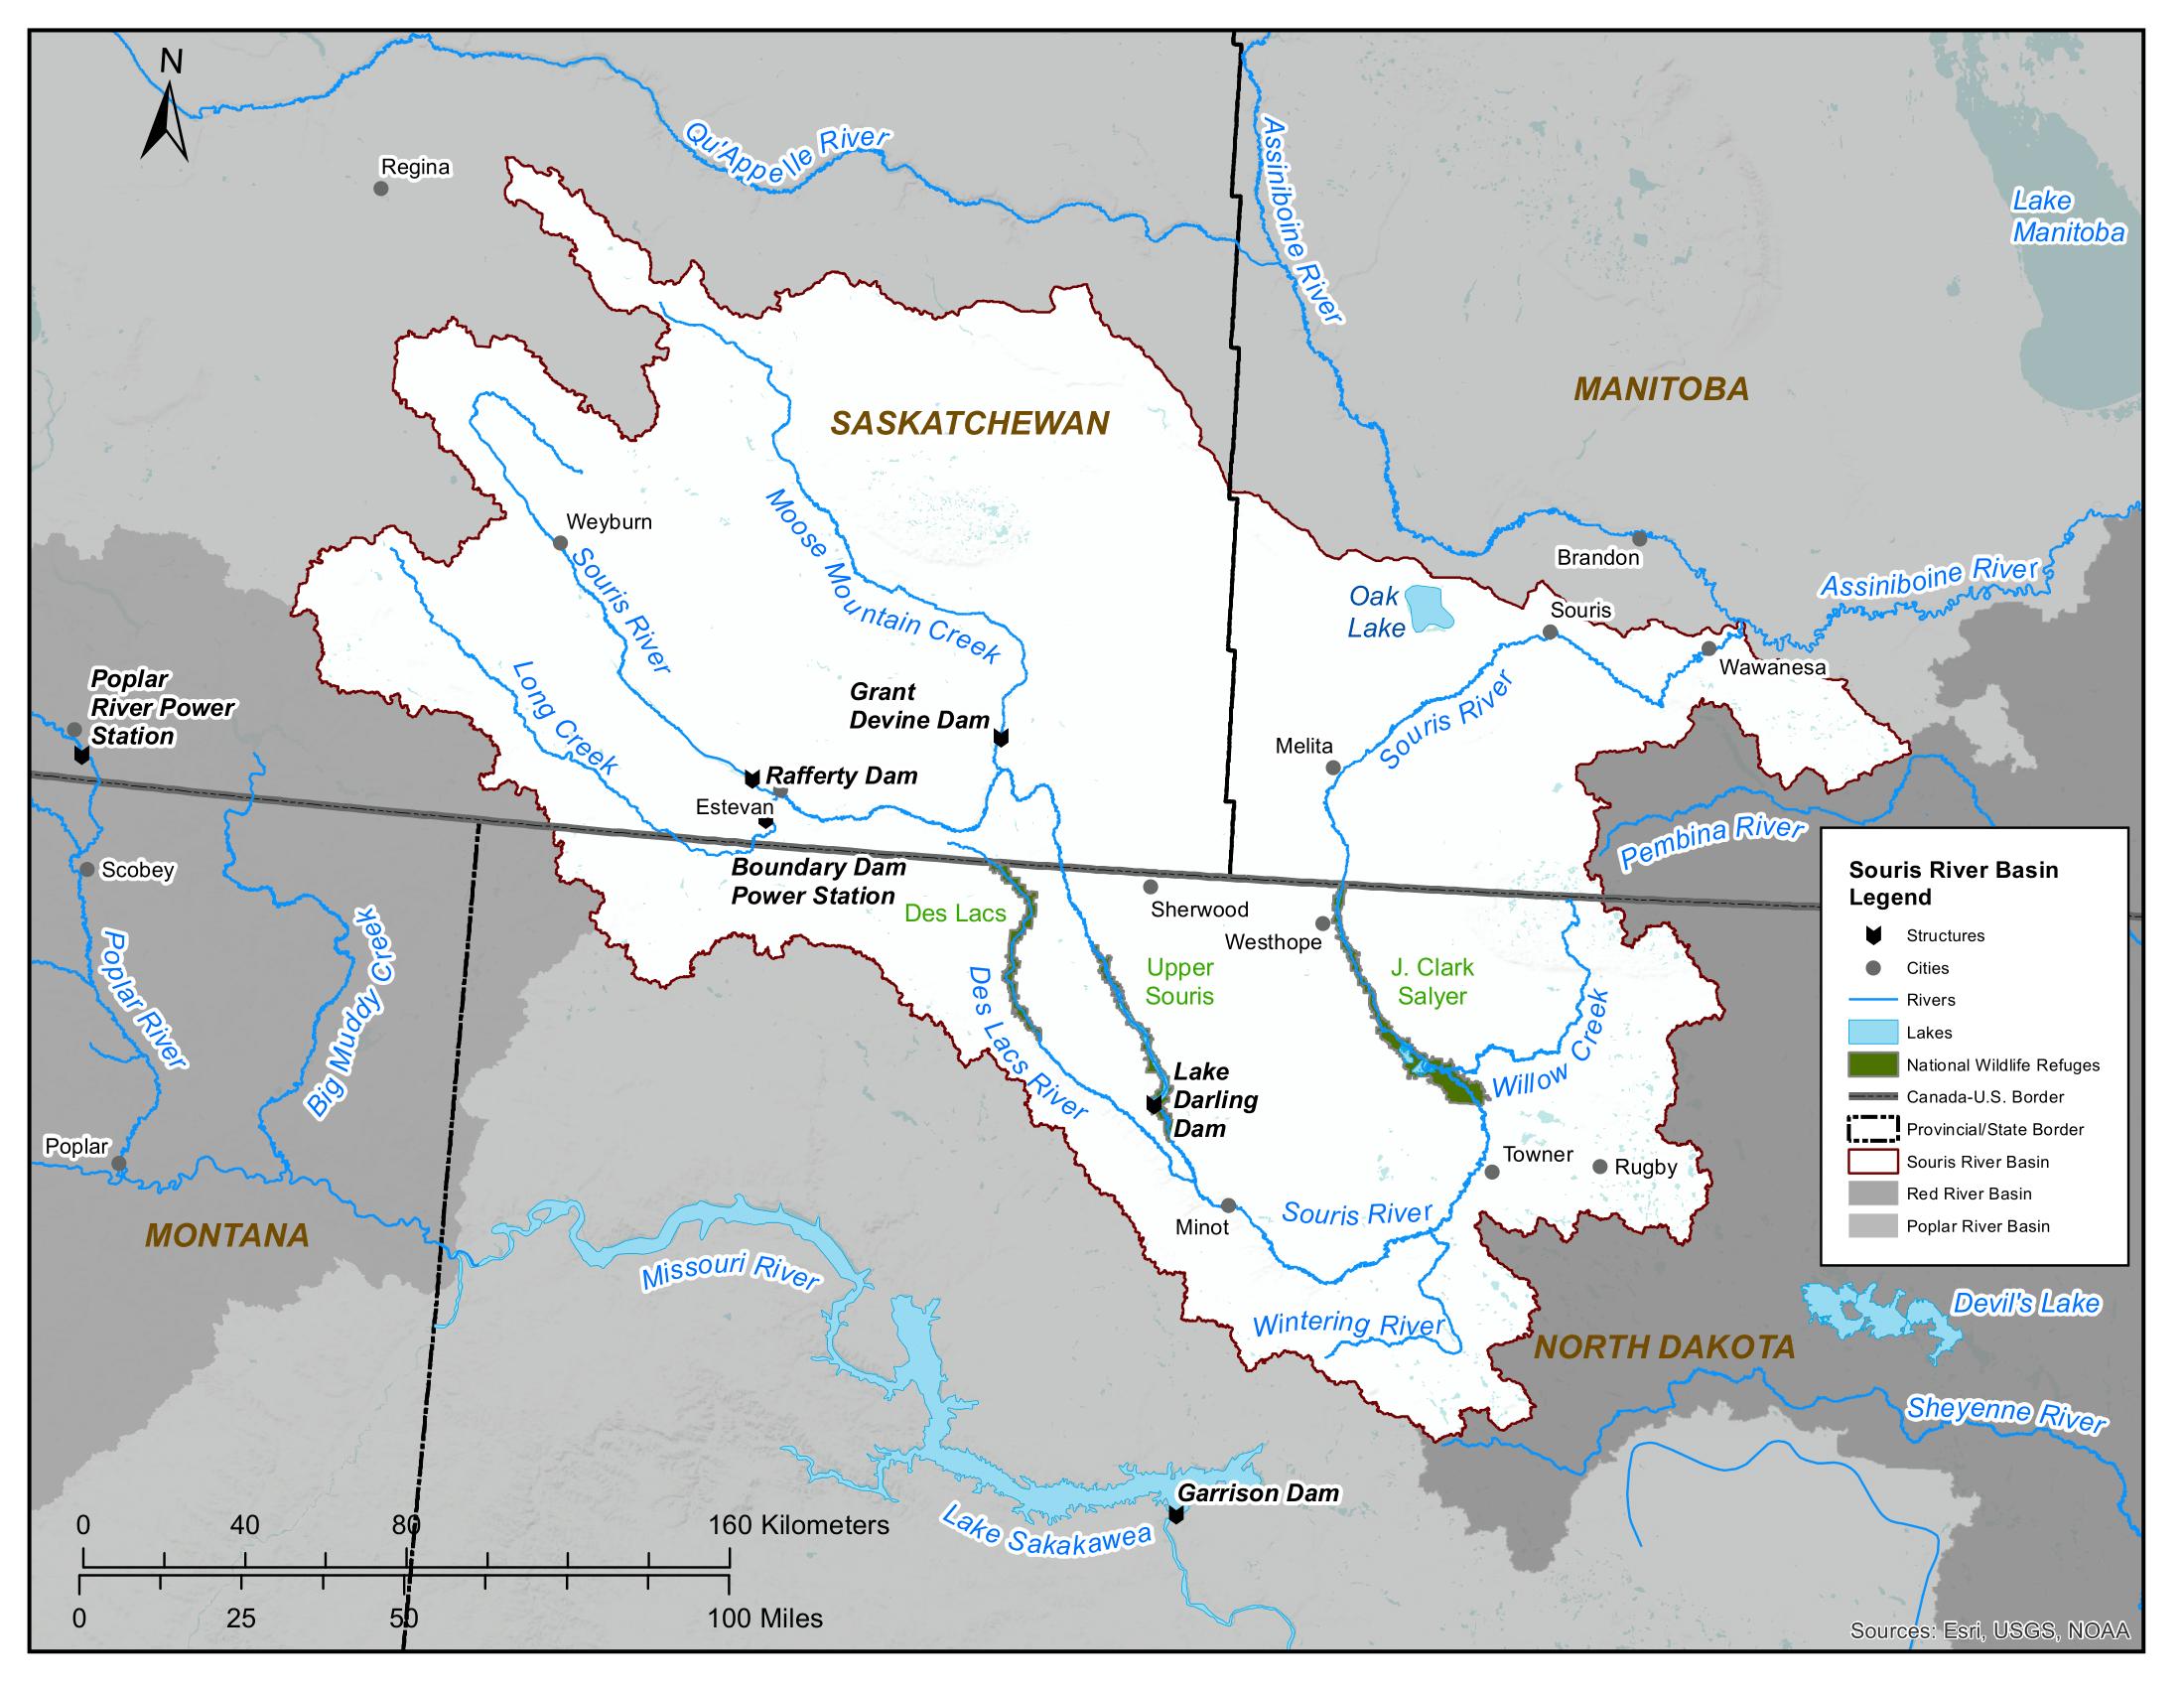 Map - Souris River Basin